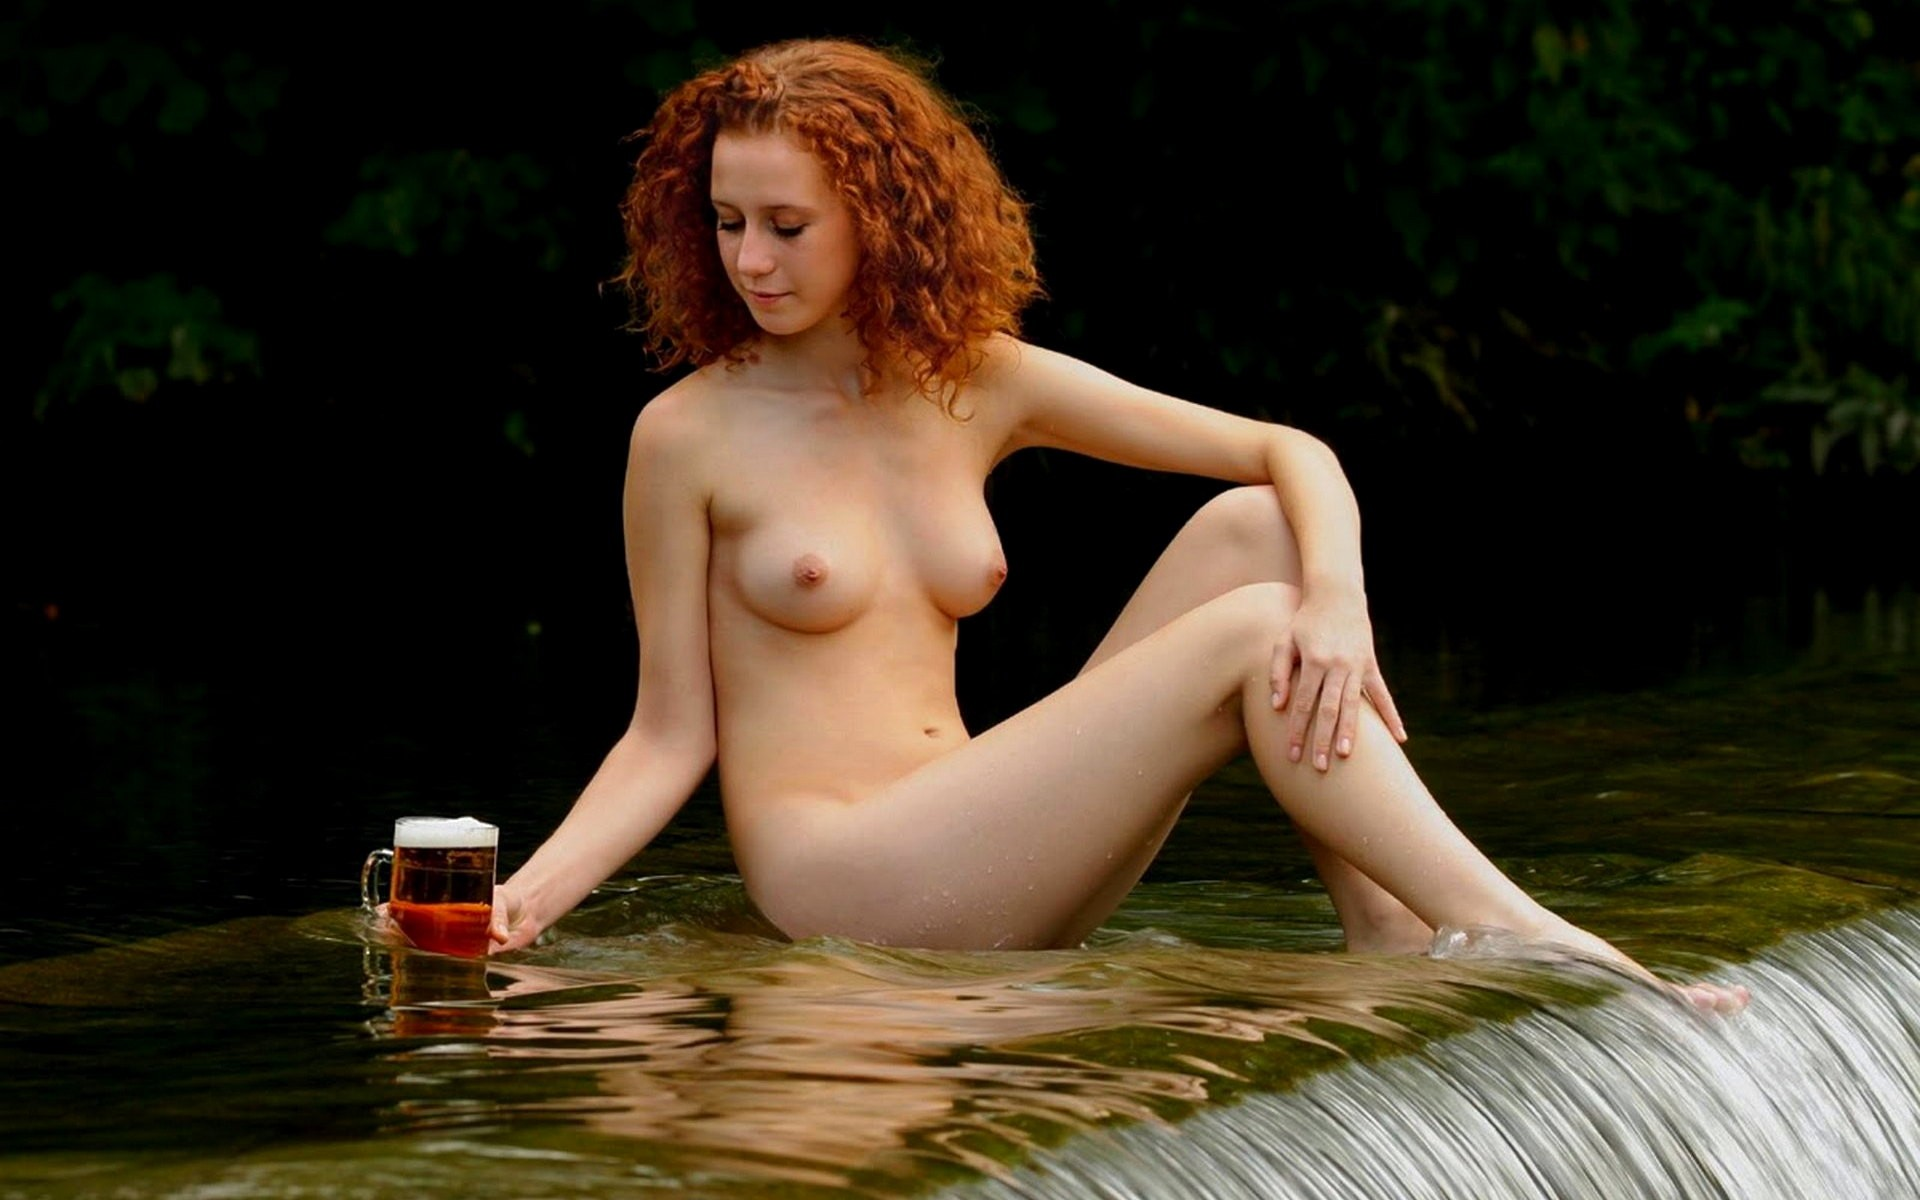 Irish natural naked, nude mud run